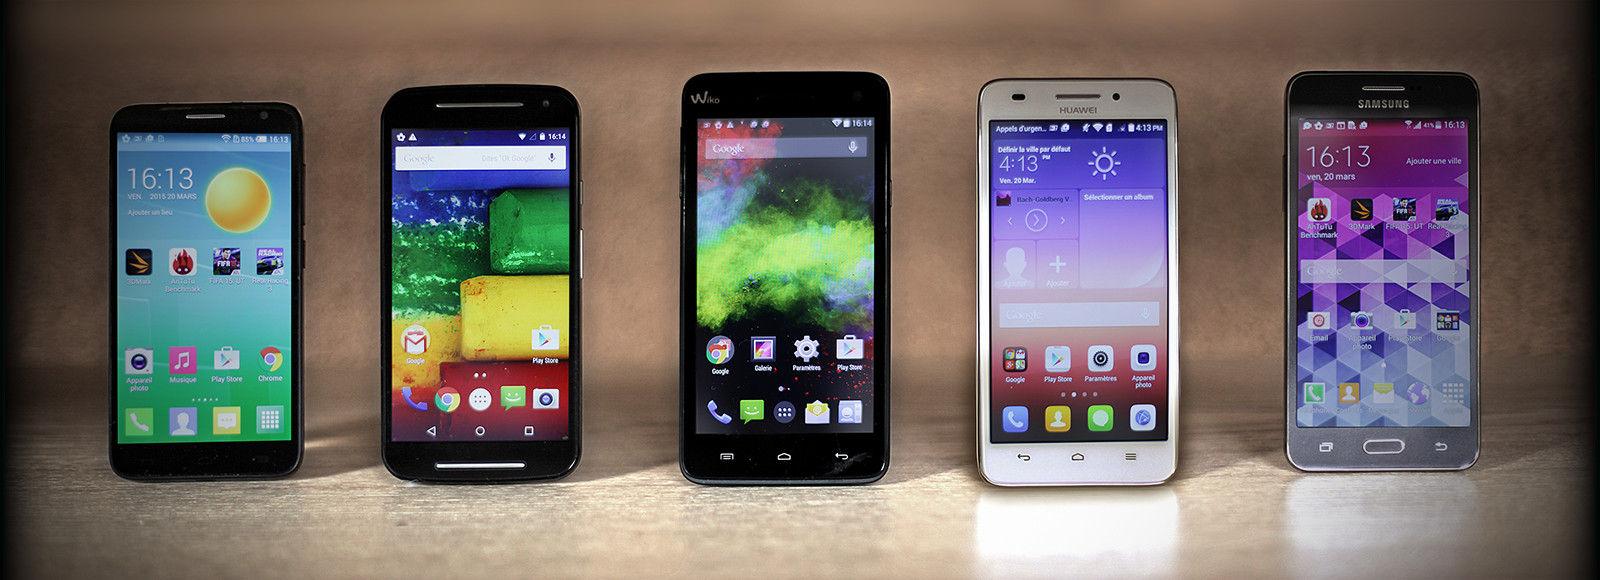 comparatif smartphone moins de 200